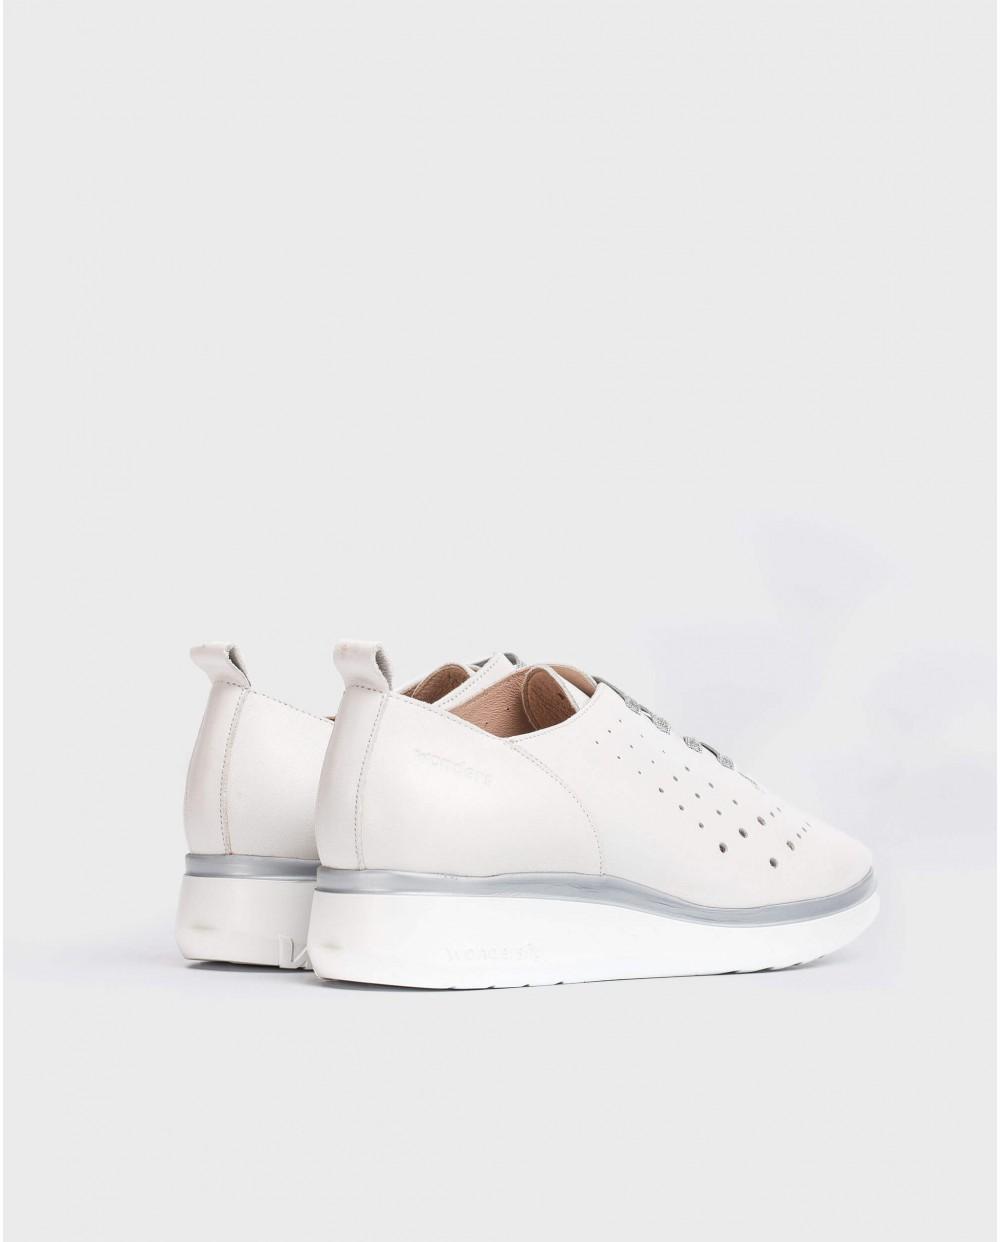 Wonders-Women-Leather sneakers with elastic detail